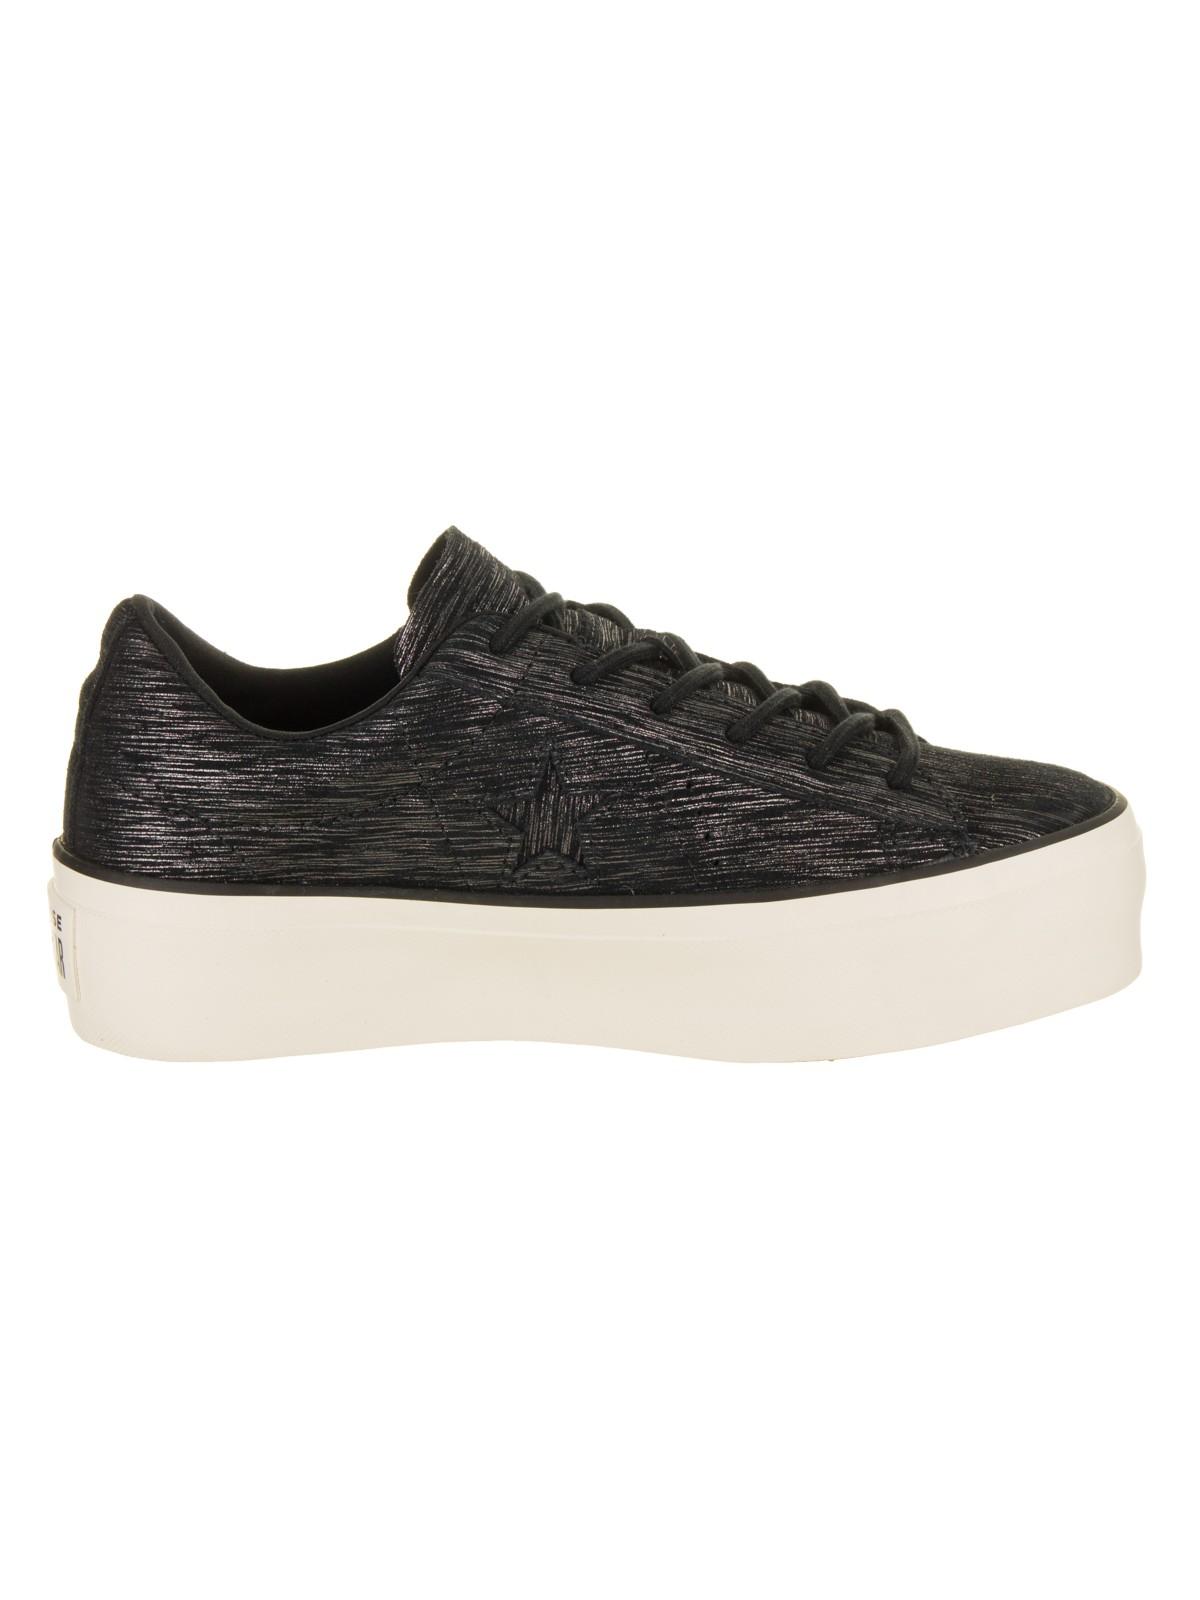 Converse Women's One Star Platform Ox Lifestyle Shoe